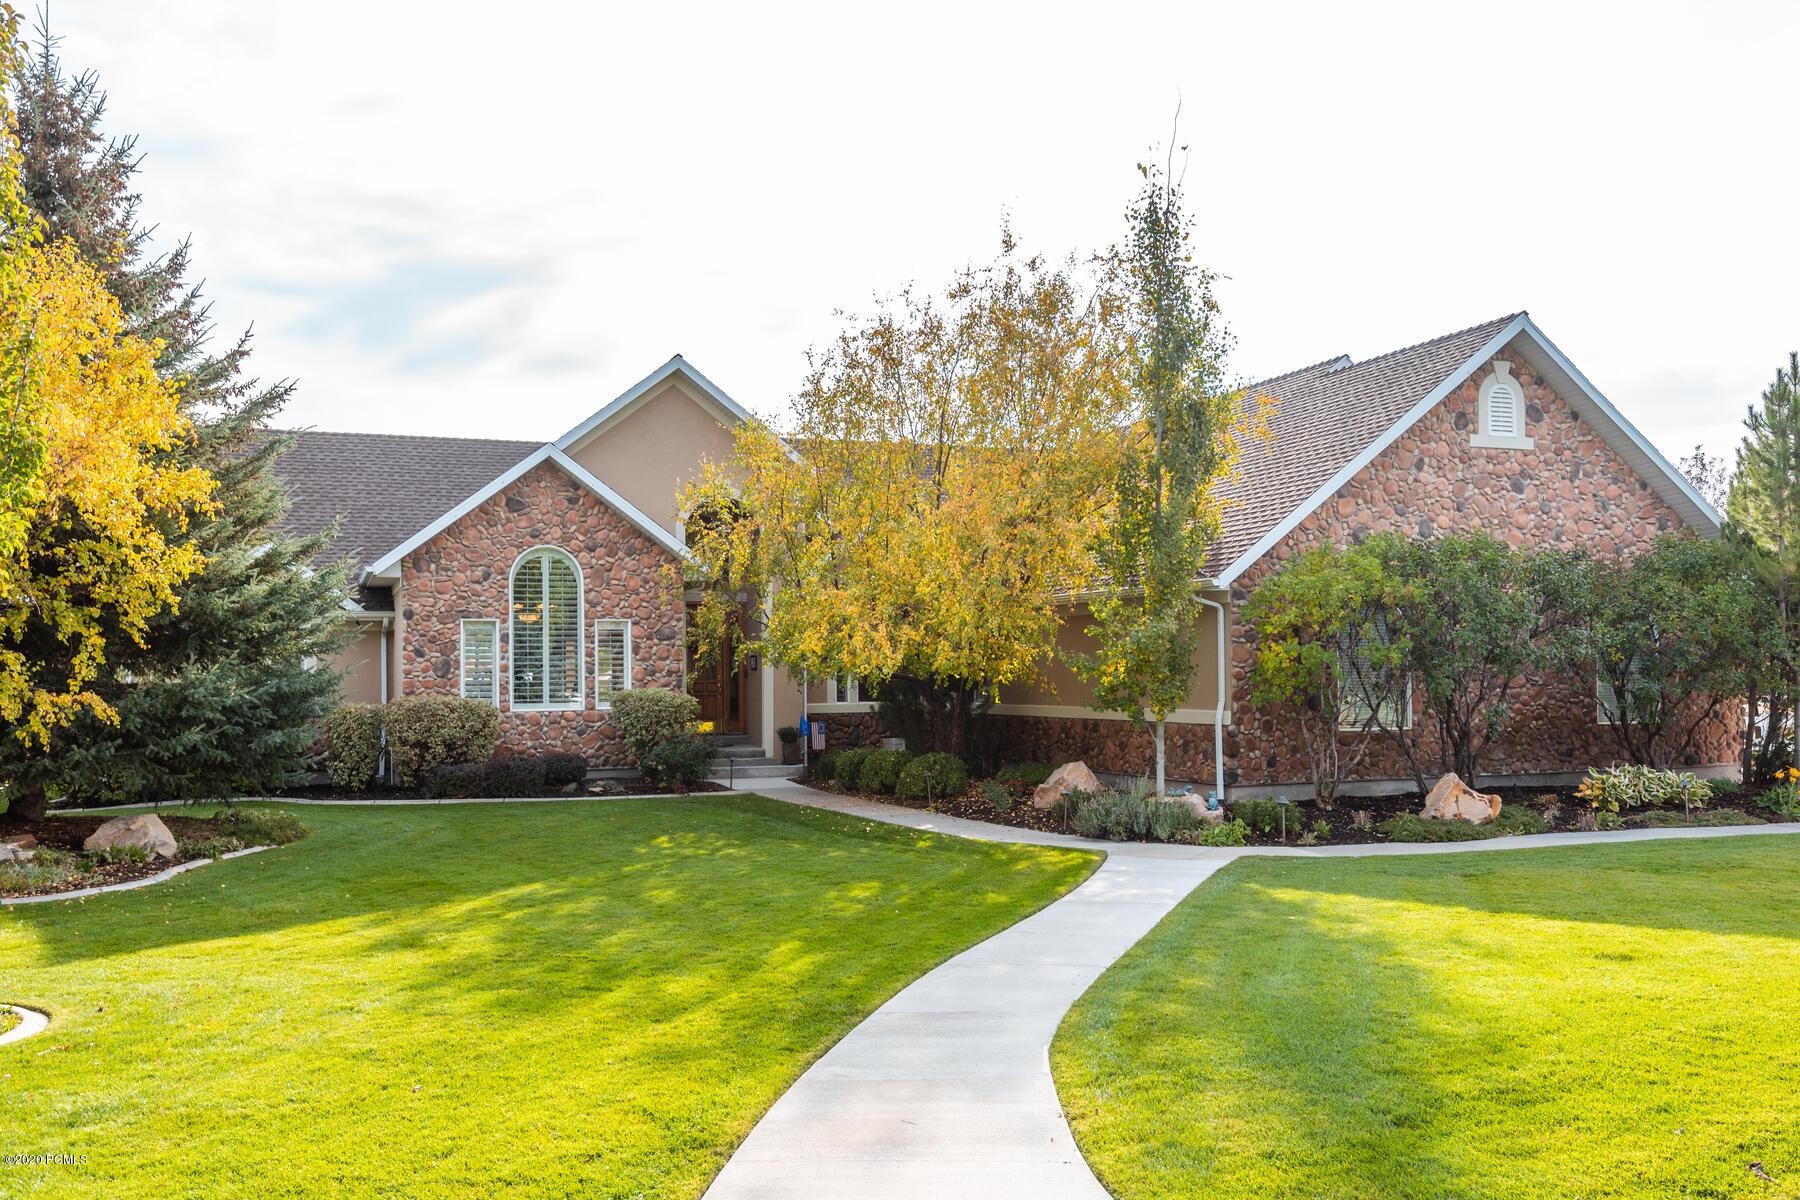 900 440 E Martha Lane, Midway, Utah 84049, 6 Bedrooms Bedrooms, ,5 BathroomsBathrooms,Single Family,For Sale,440 E Martha,12003827